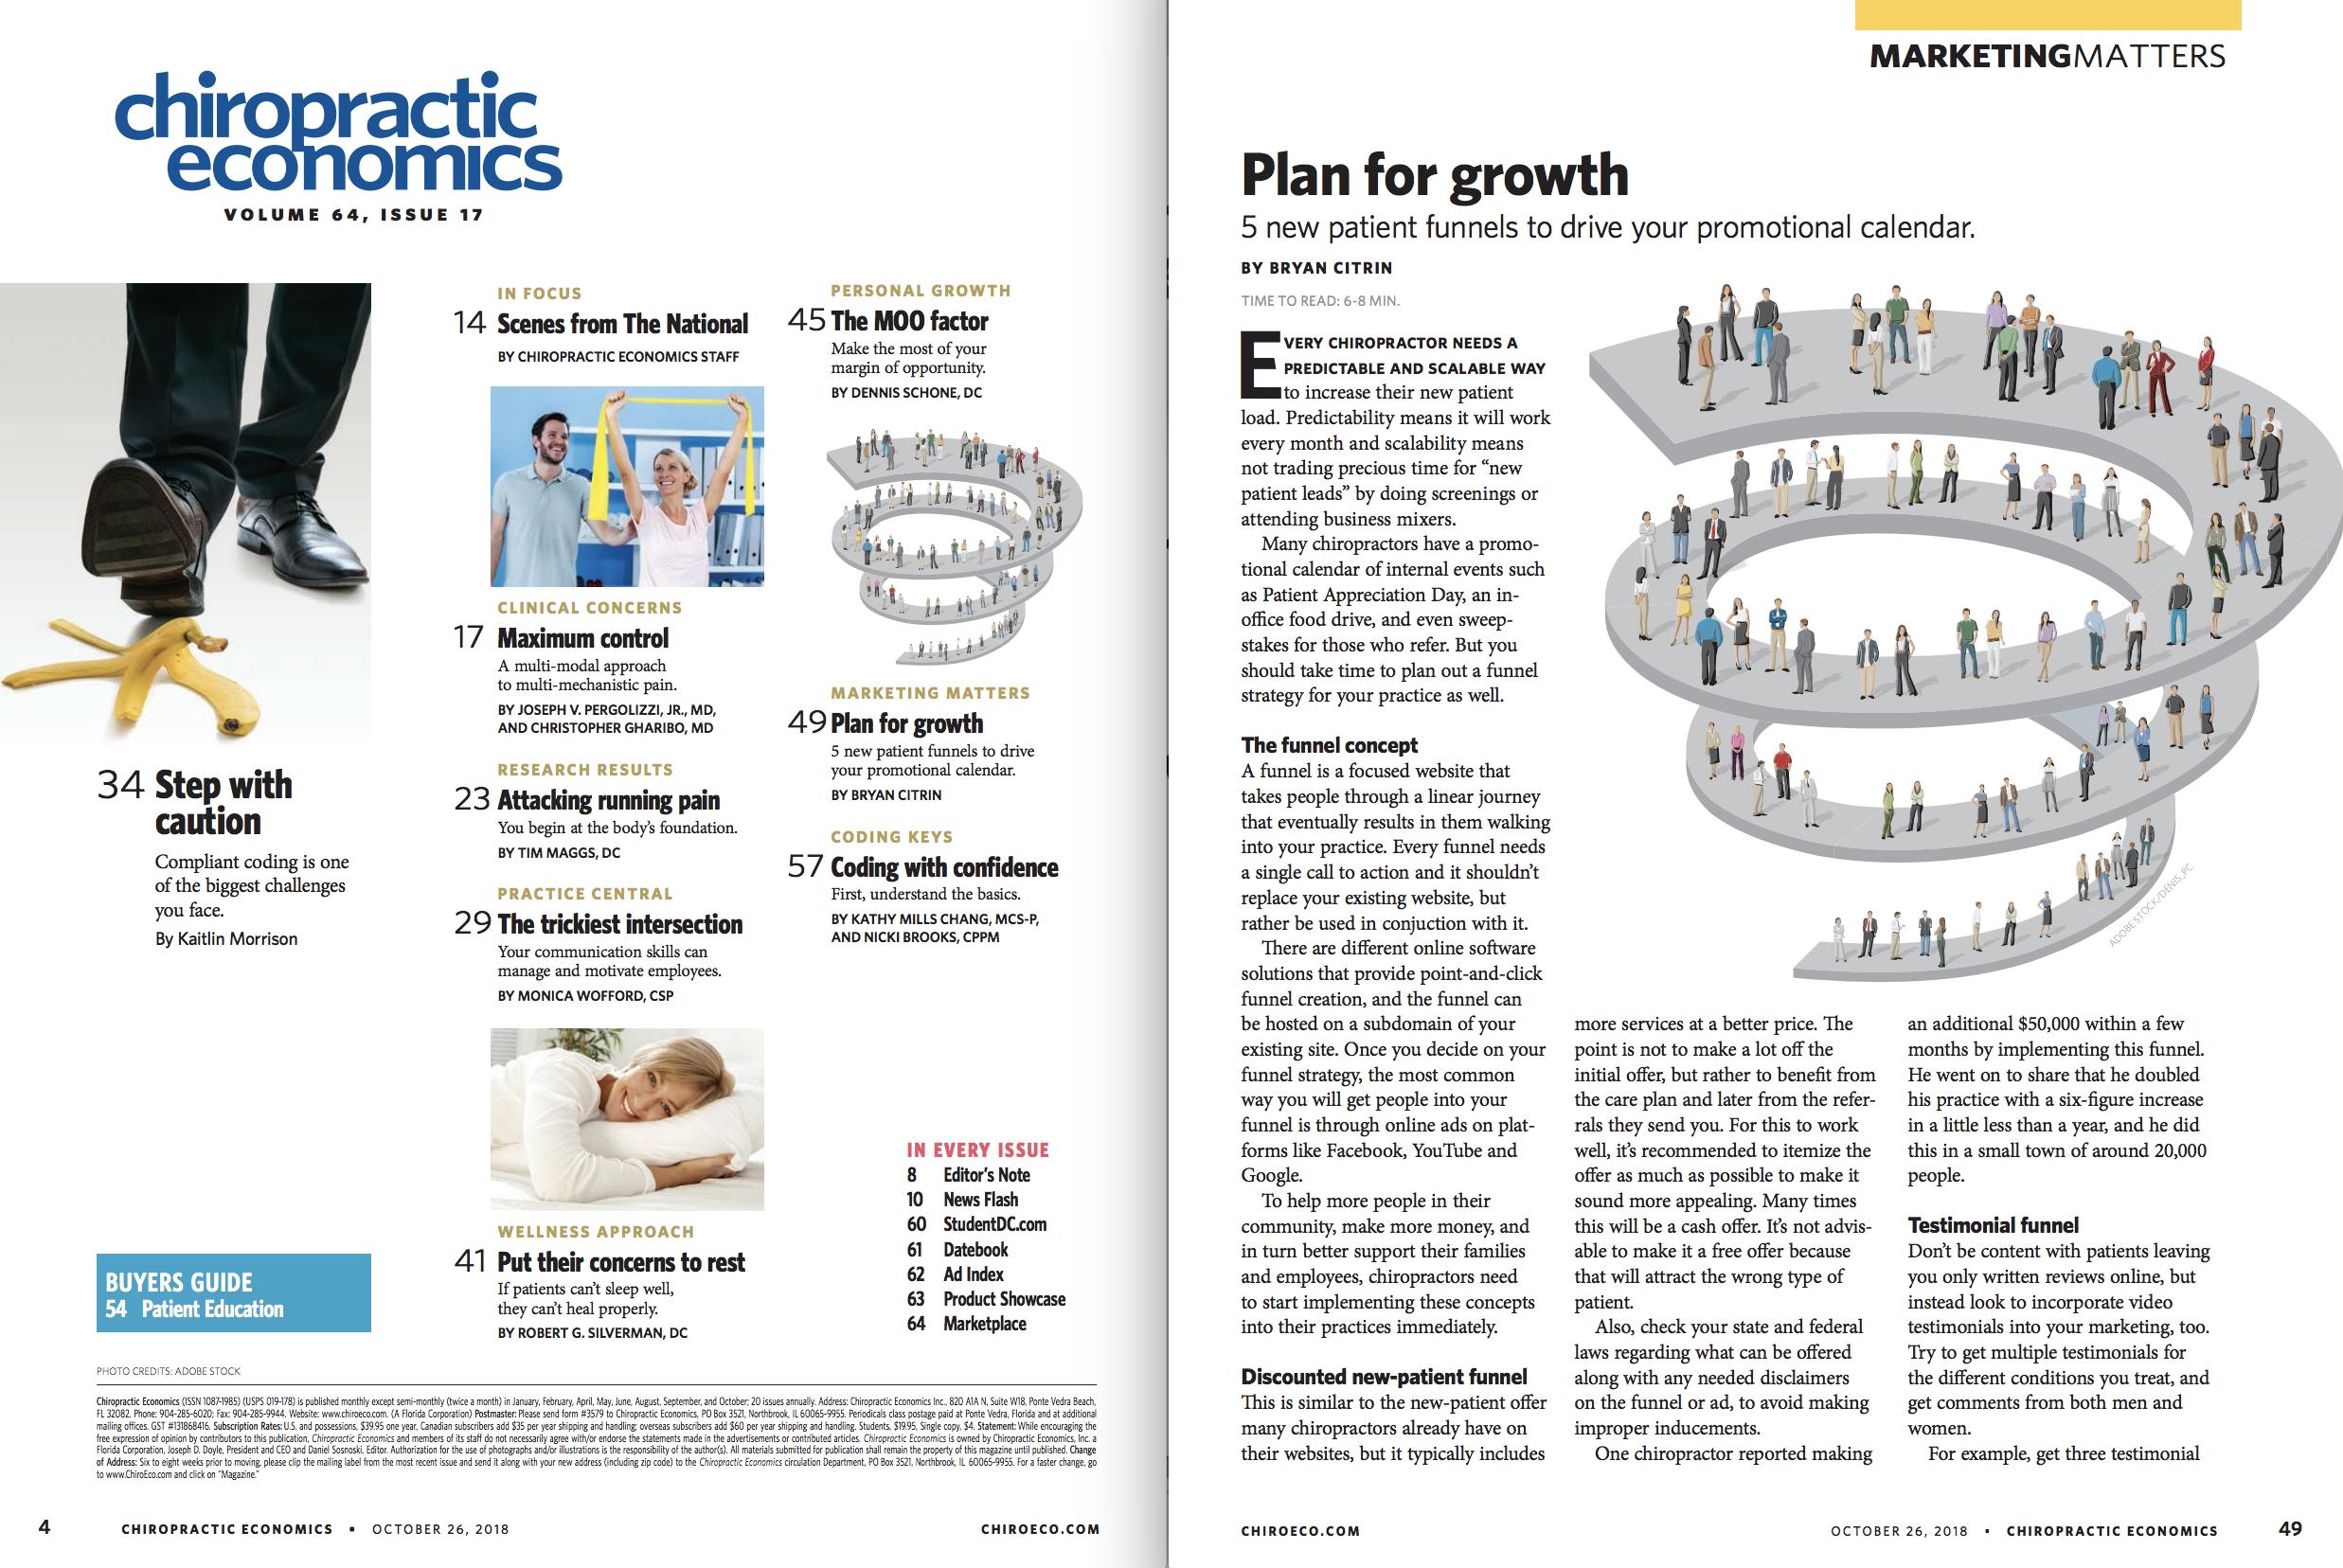 Chiropractic Economics Page 49 Spread